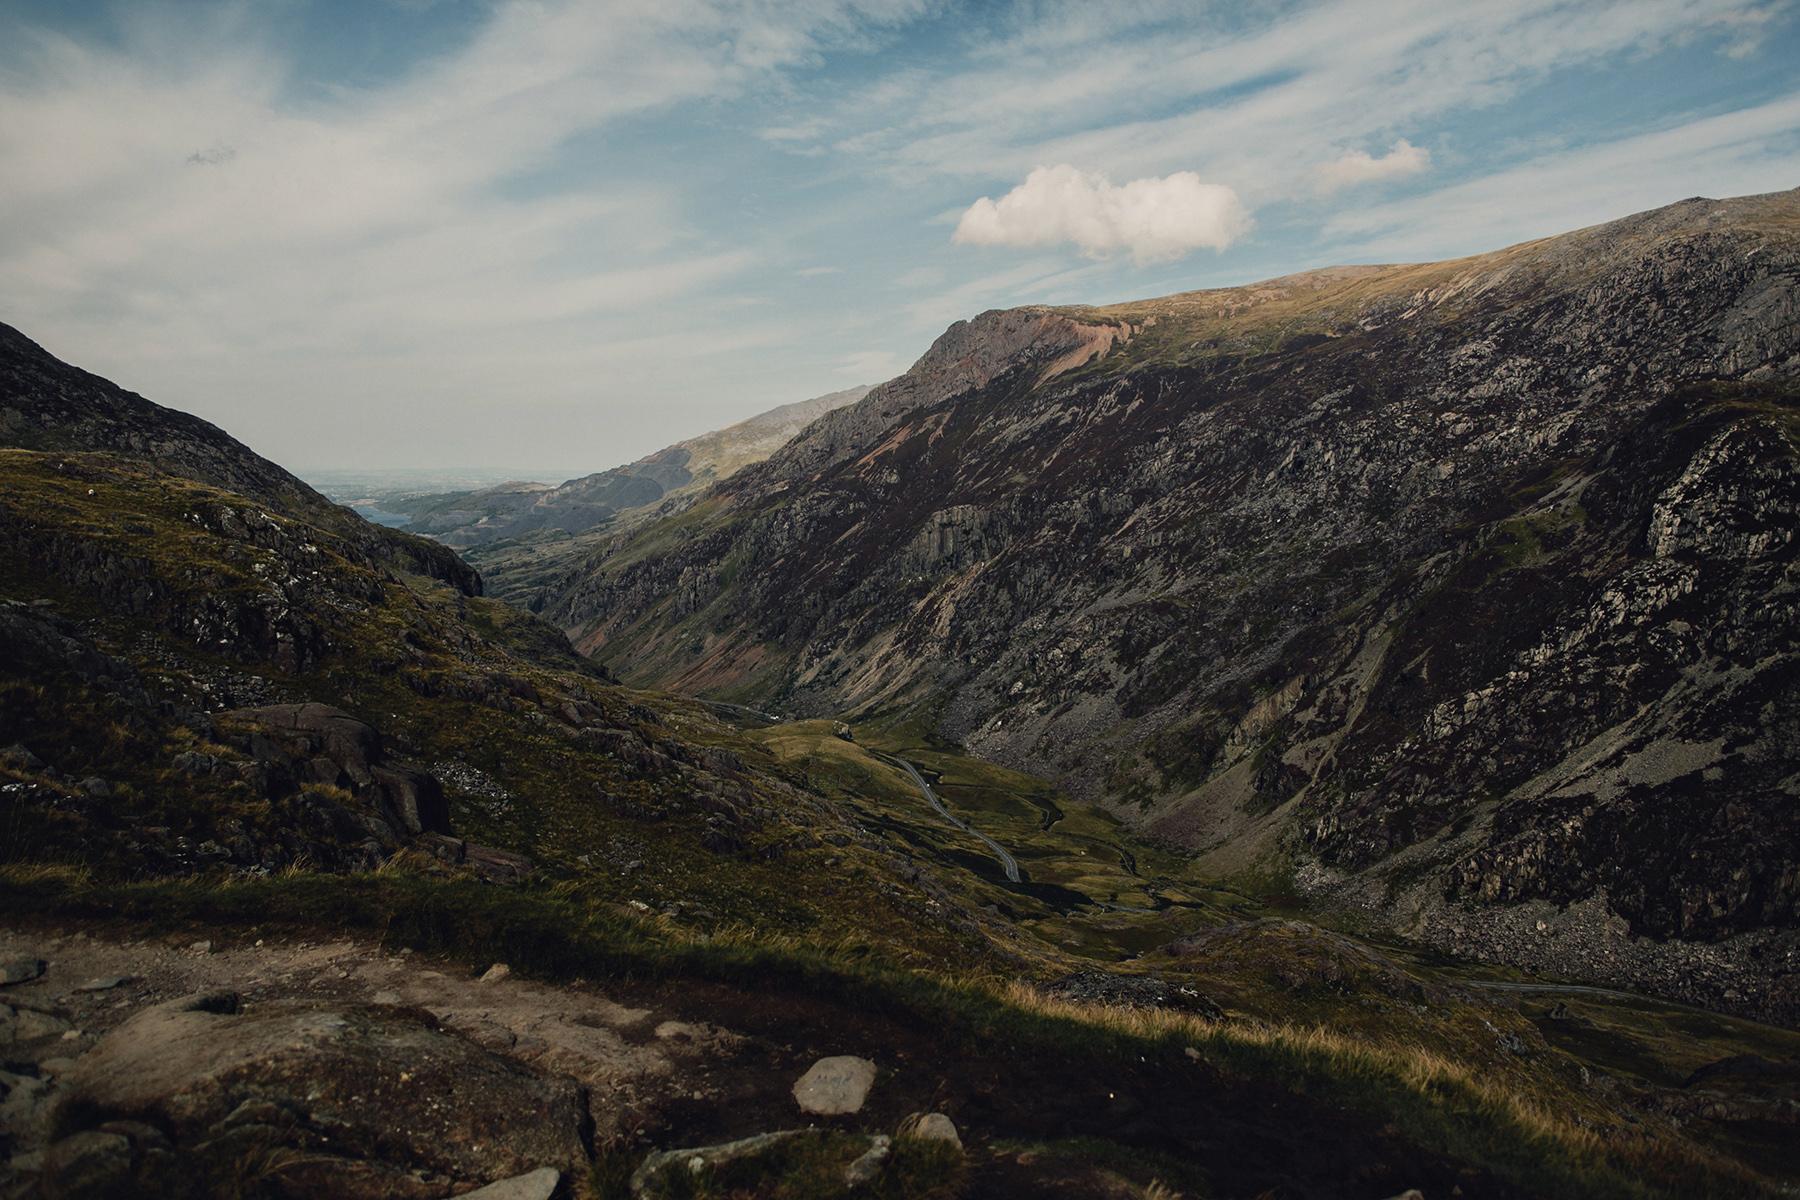 Mt-Snowdon-Hike-Photos-From-Peny-Pass-00041.jpg